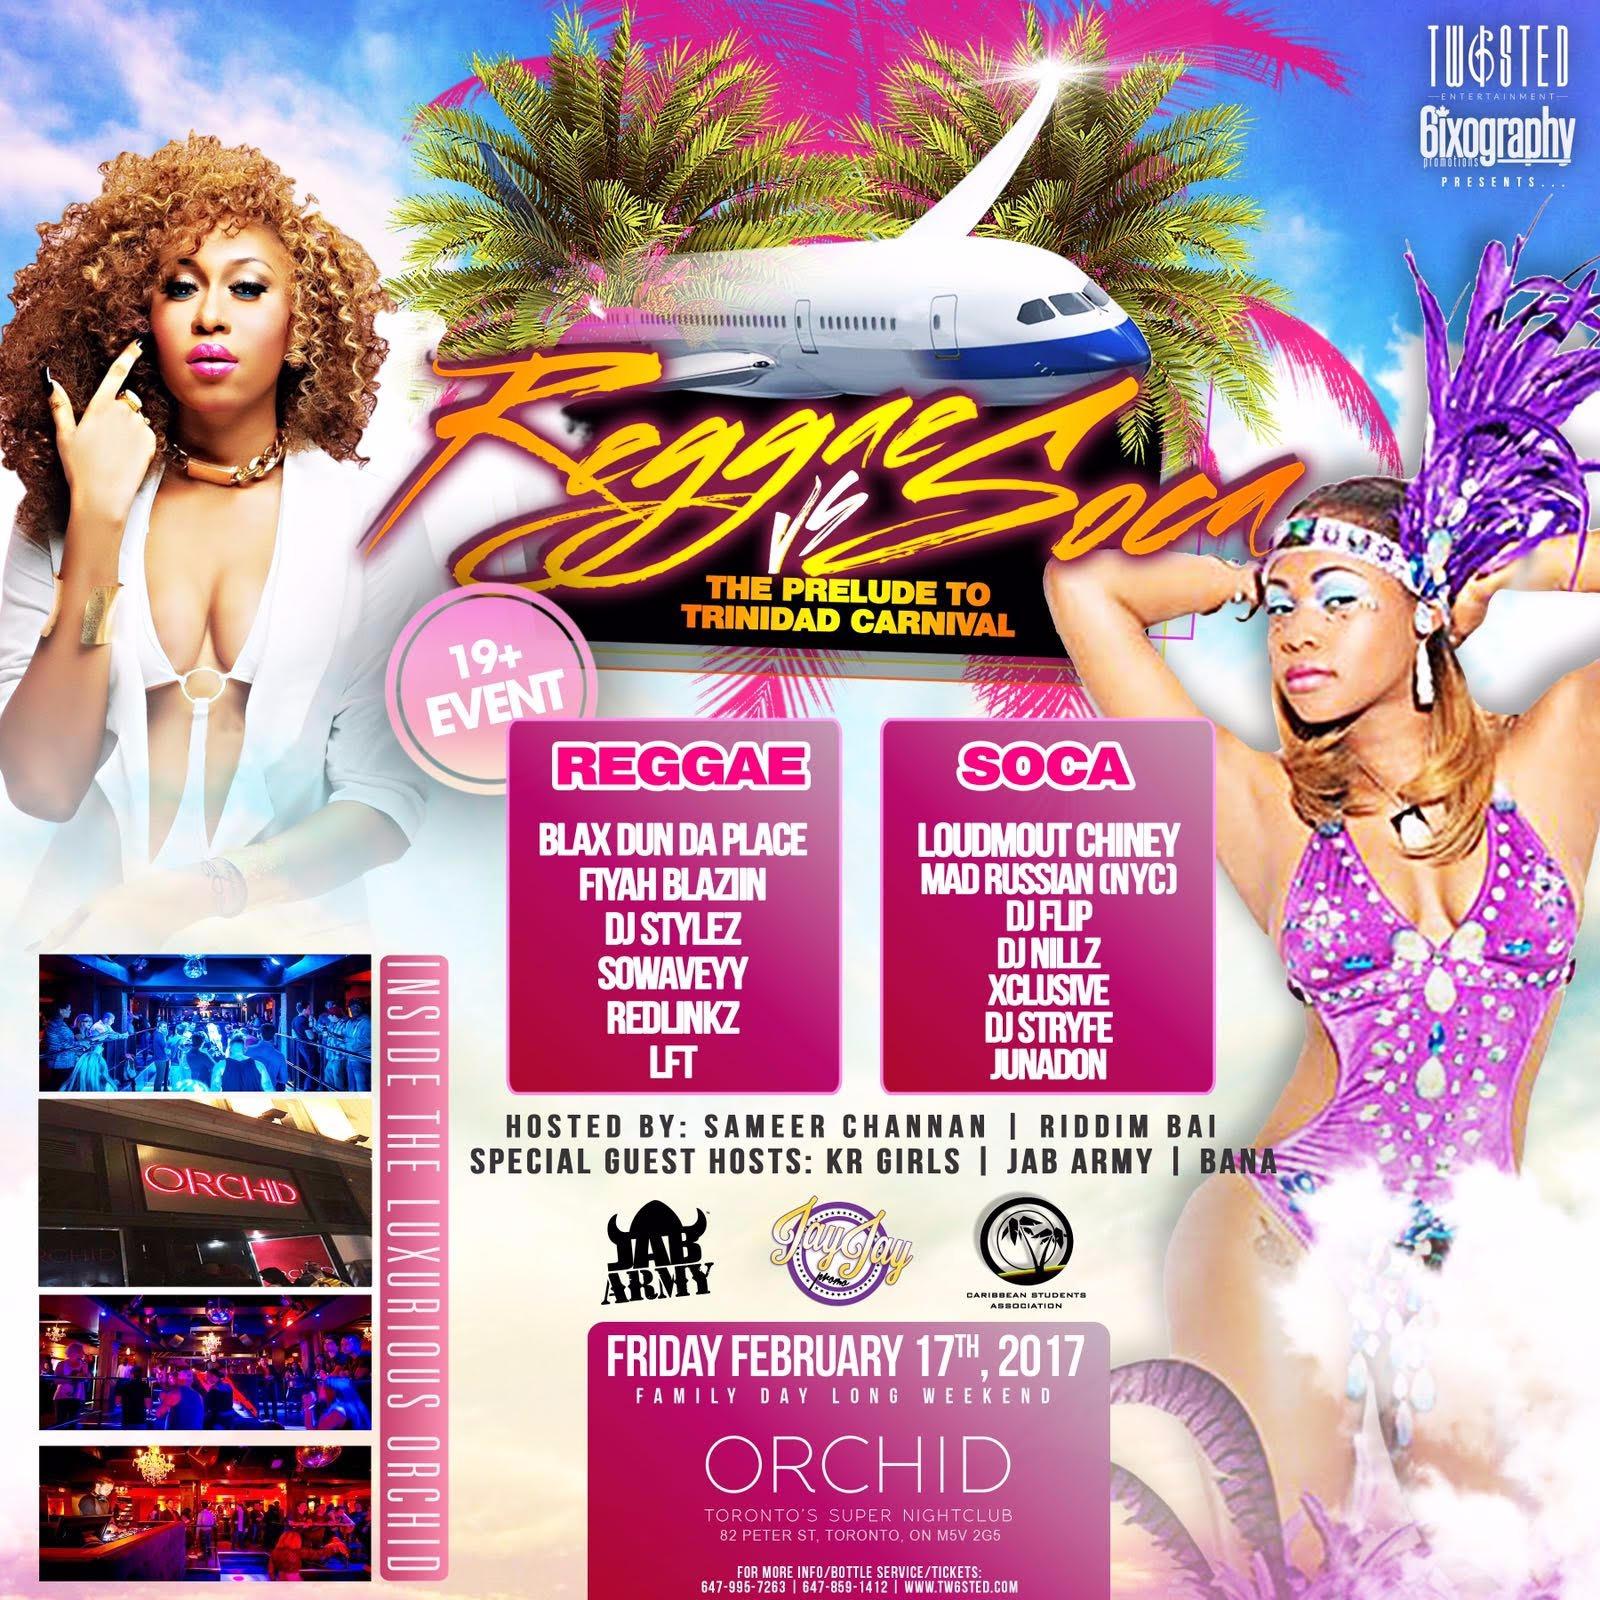 Reggae Vs Soca: Prelude To Trinidad Carnival | Family Day Long Weekend